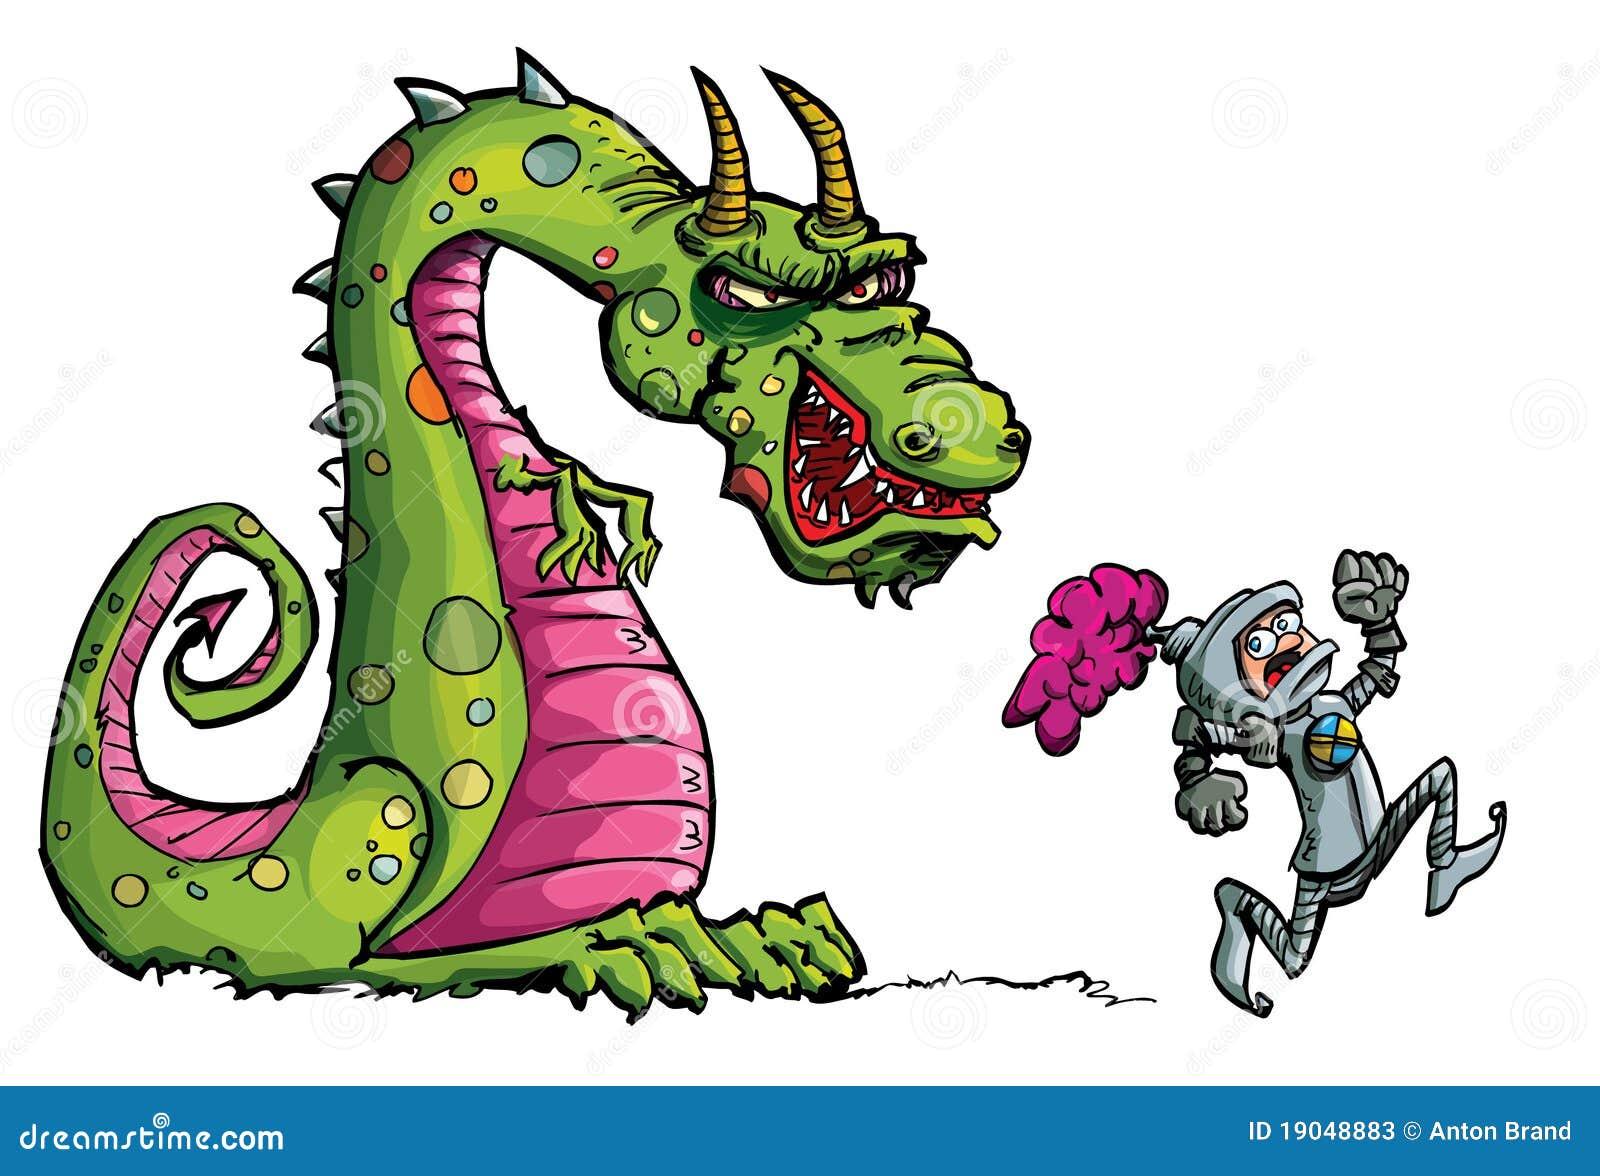 cartoon of a knight running from a fierce dragon stock photos